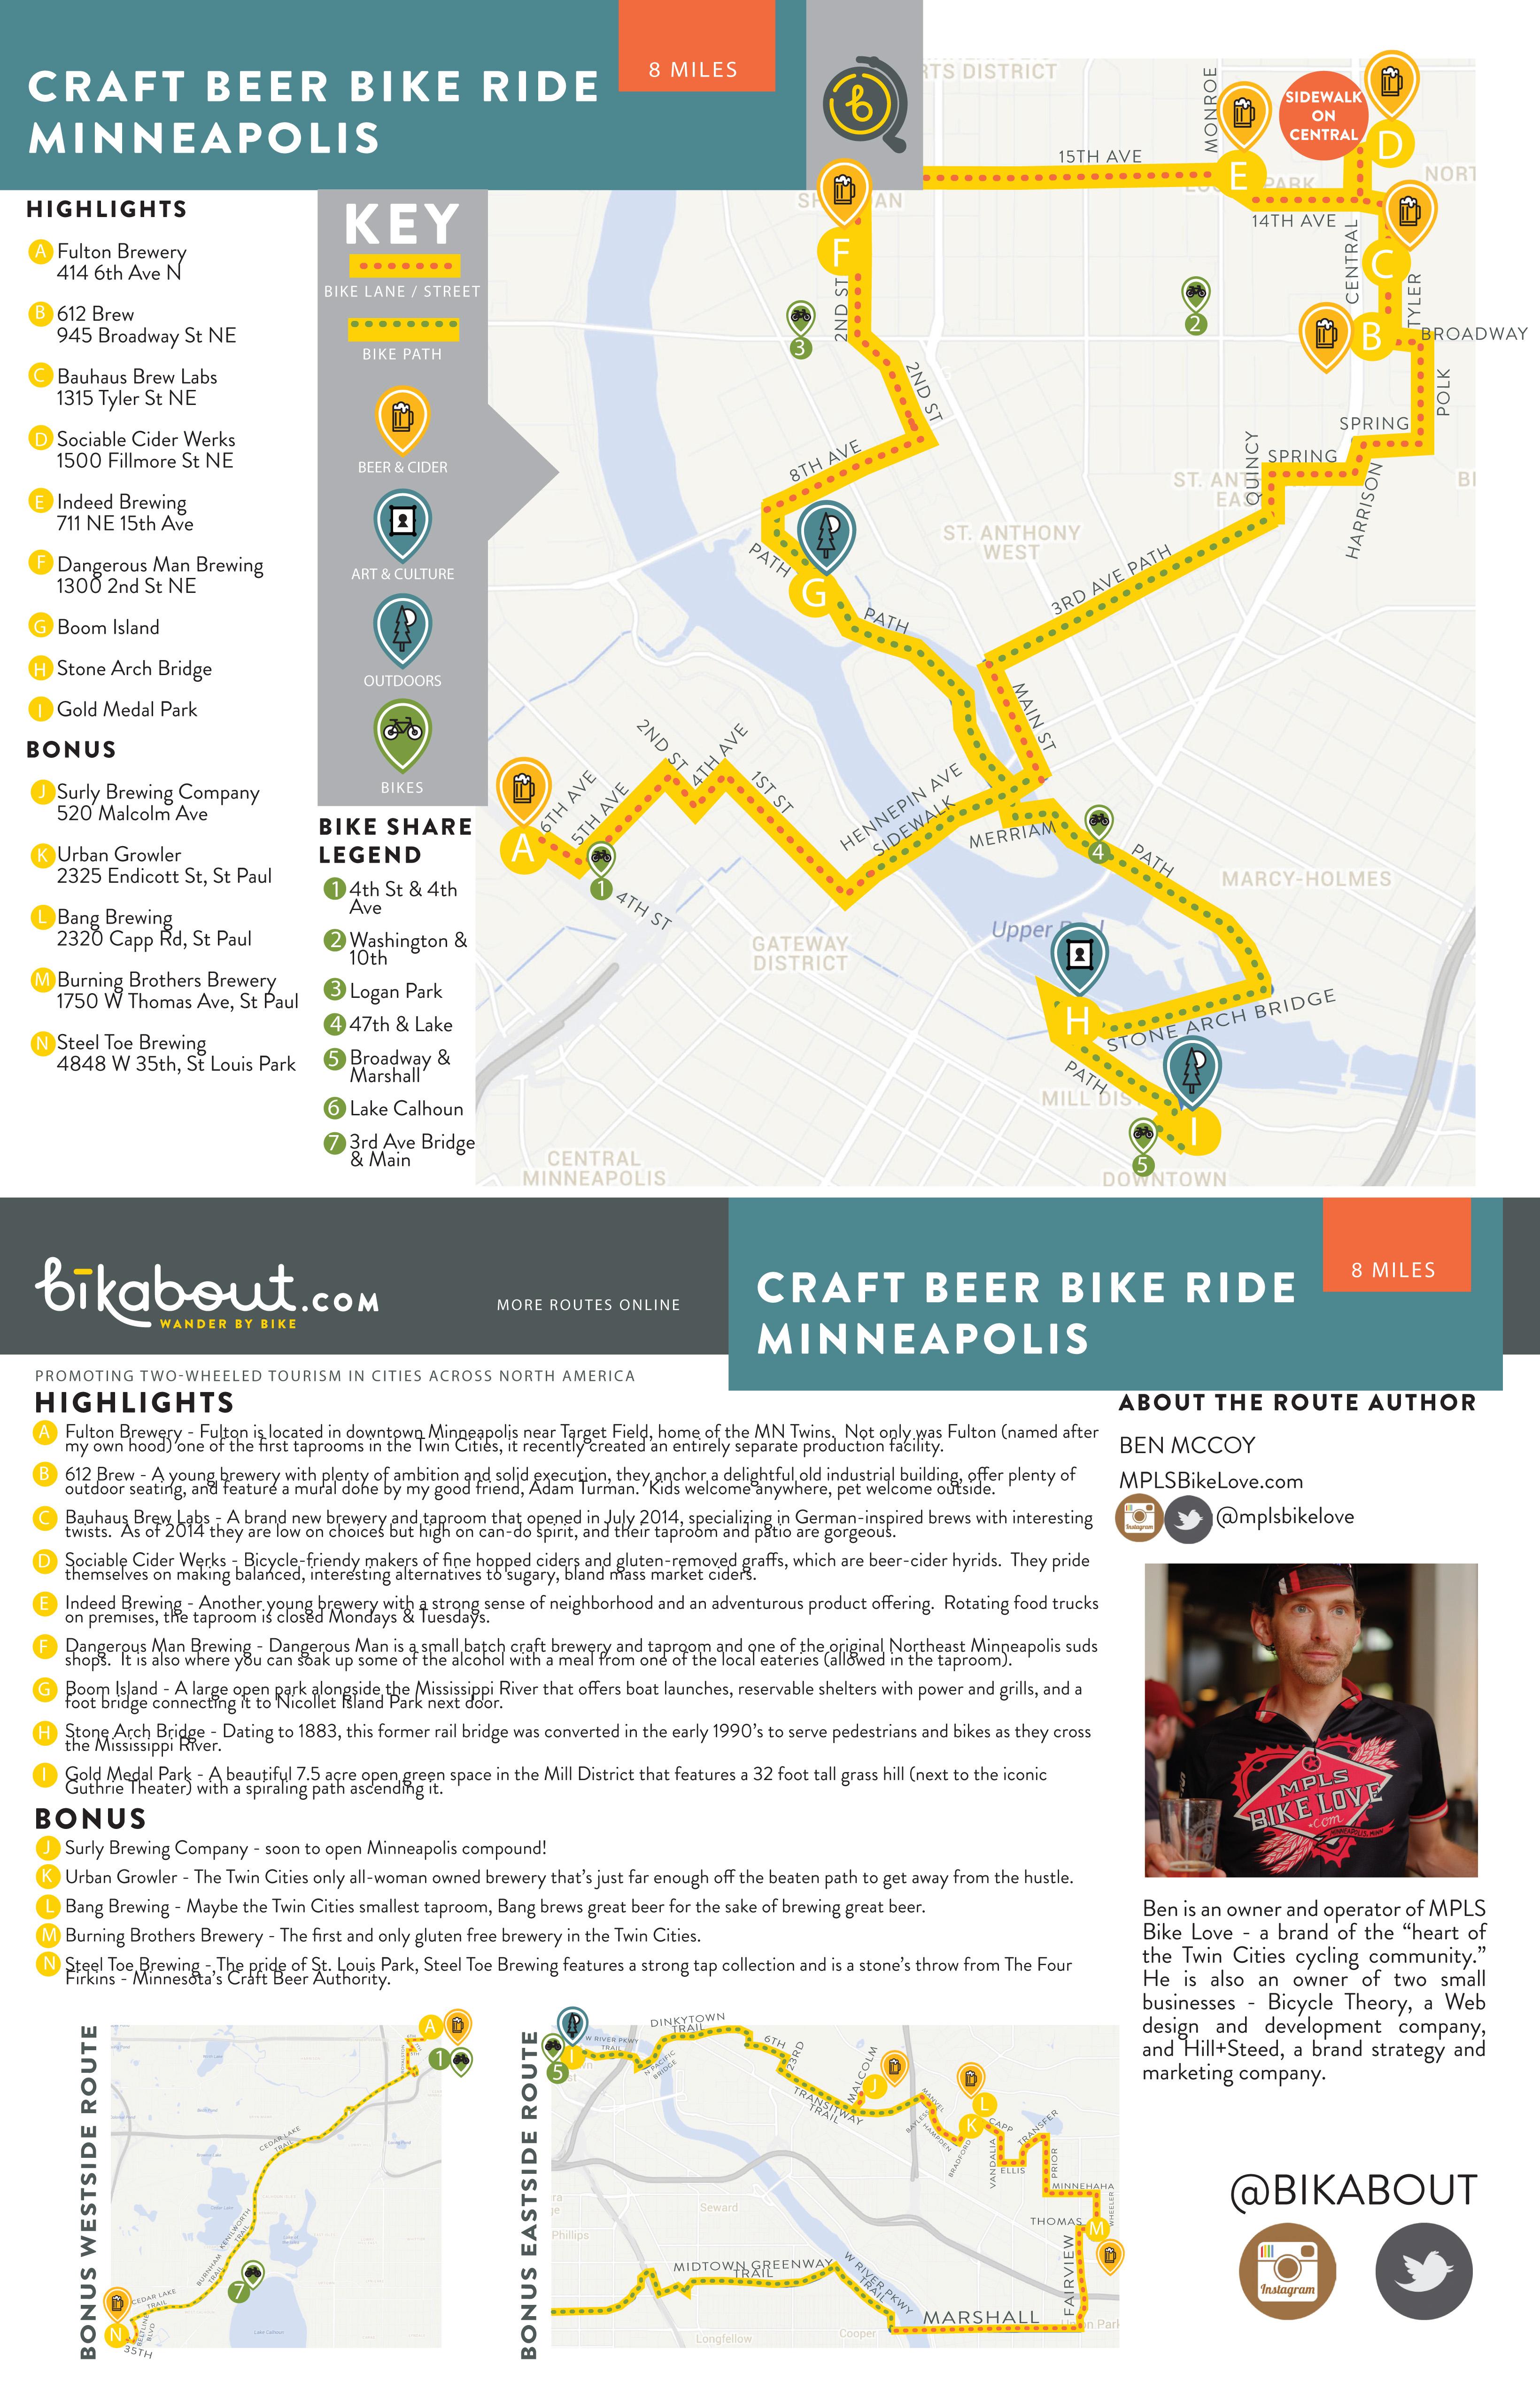 Craft Beer Bike Ride Minneapolis  bikabout